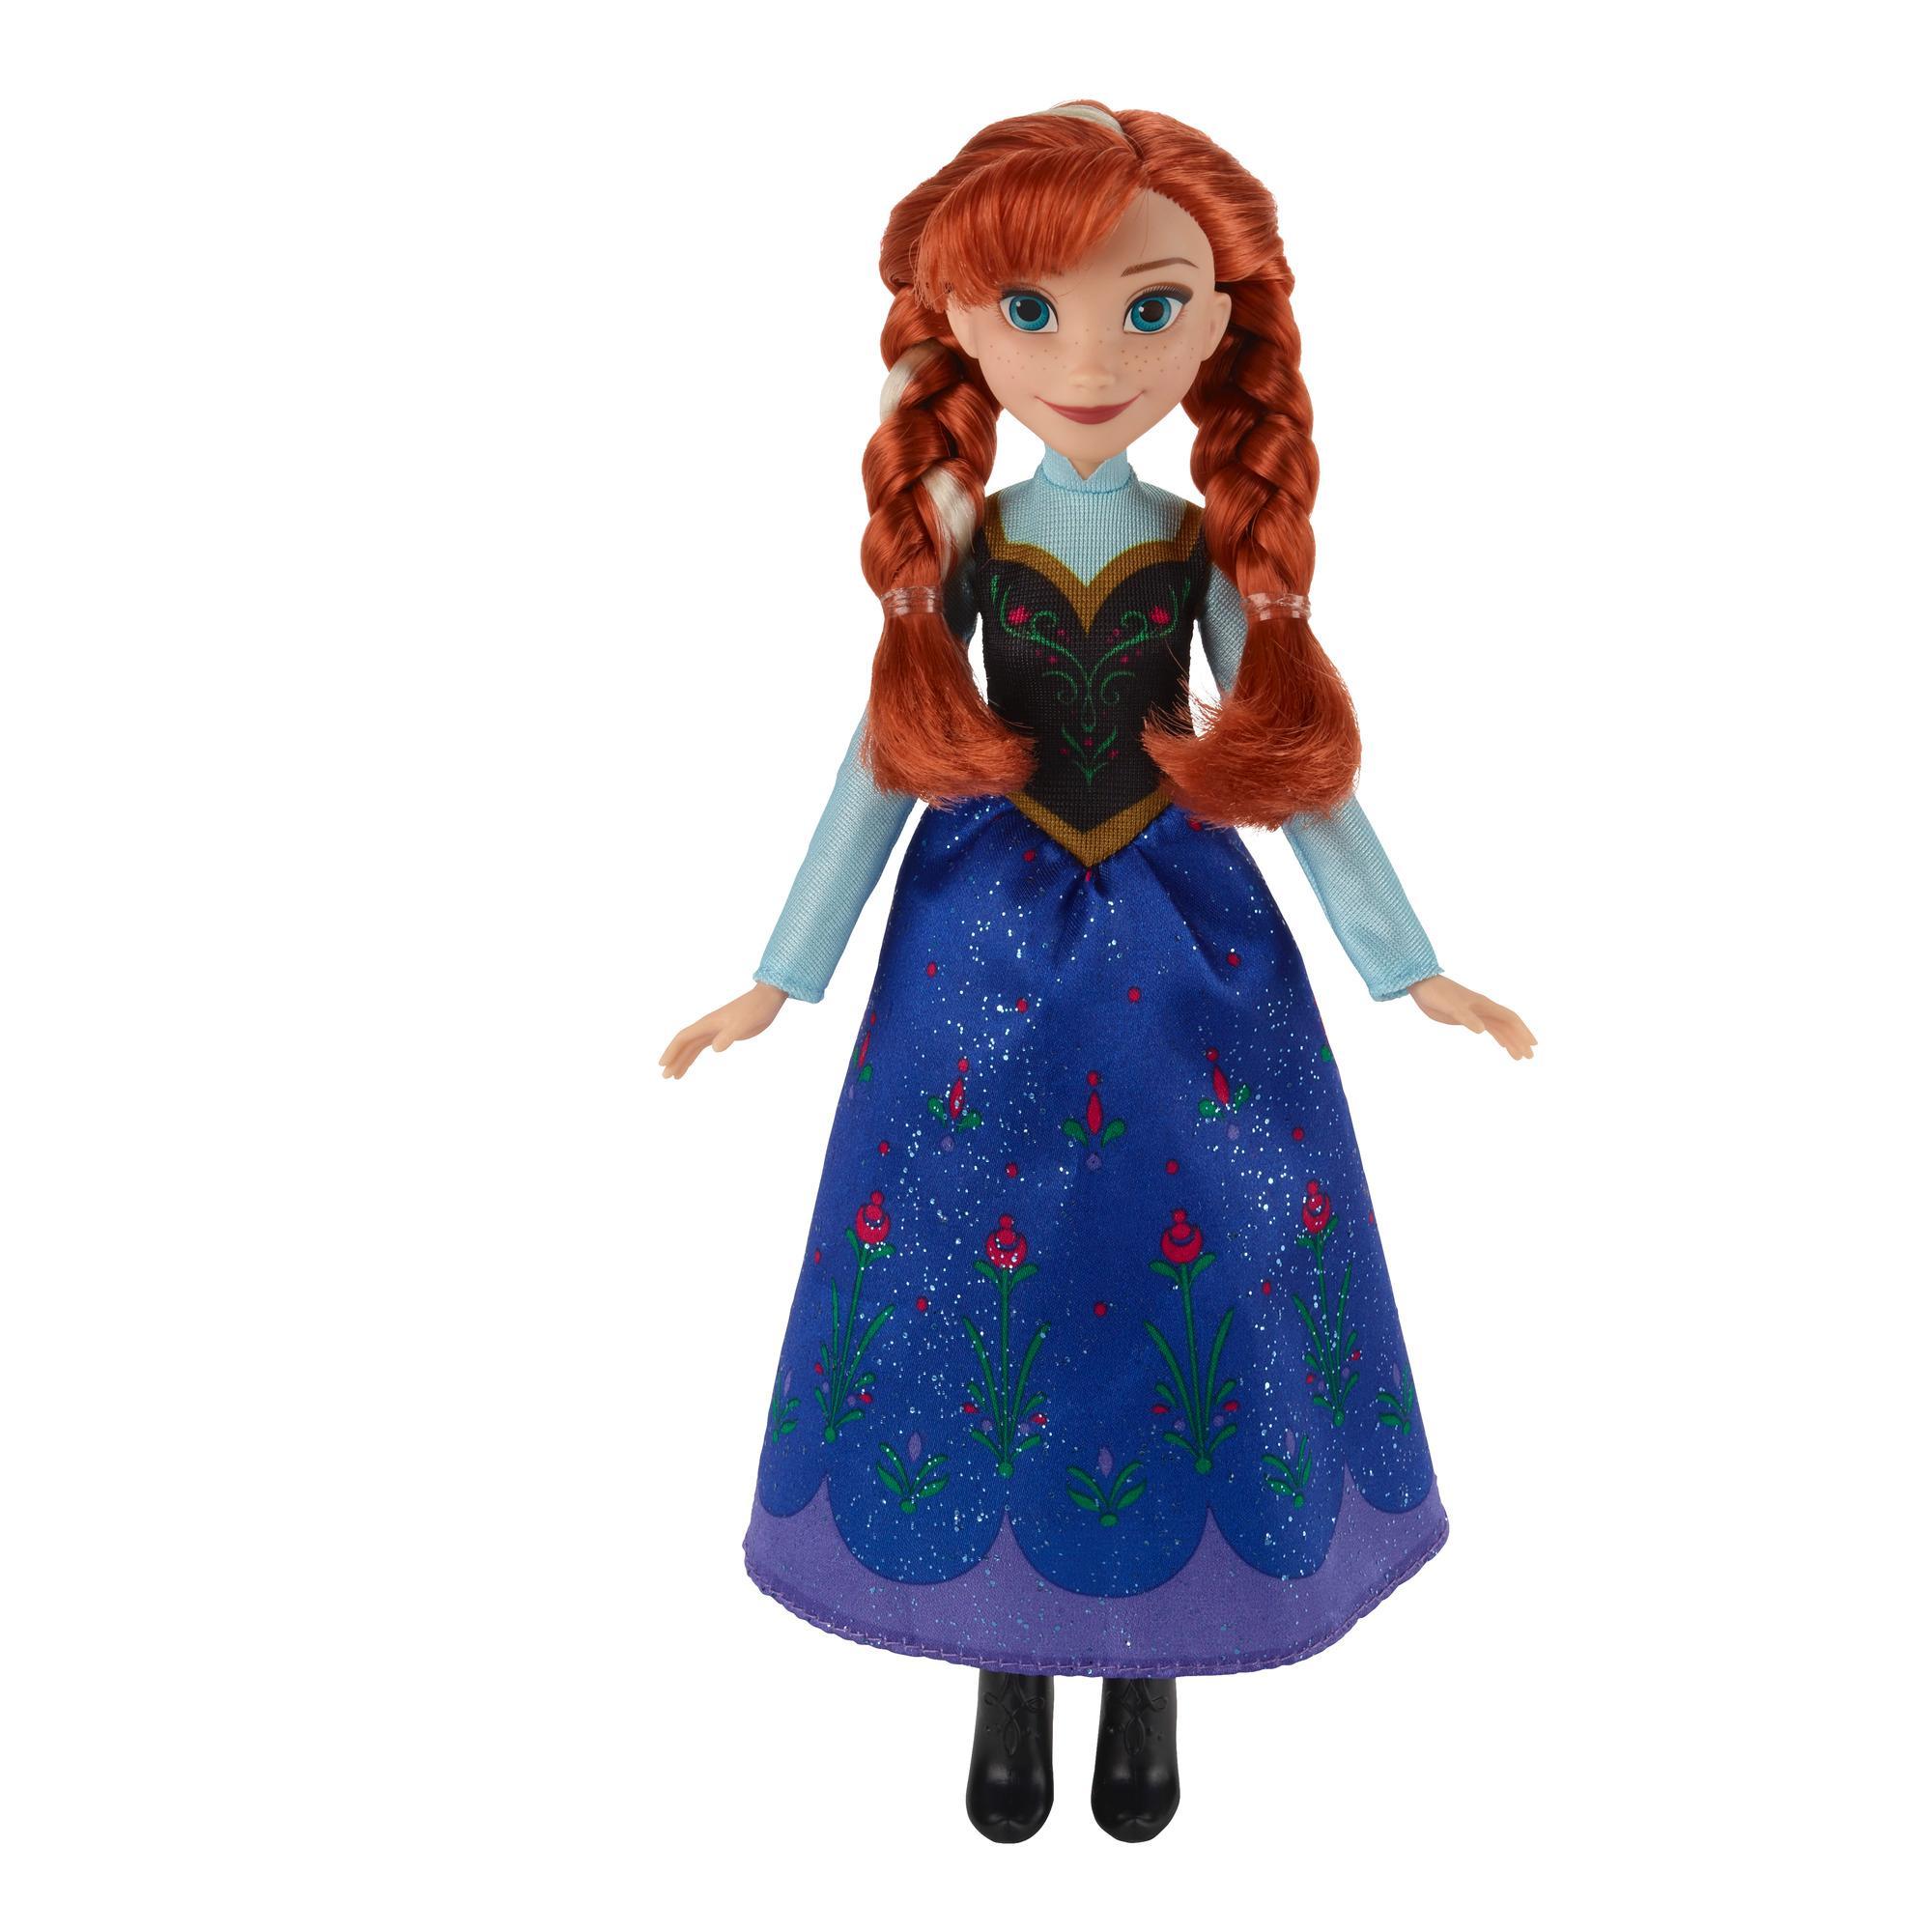 Anna Moda Clásica de Frozen Una aventura congelada de Disney